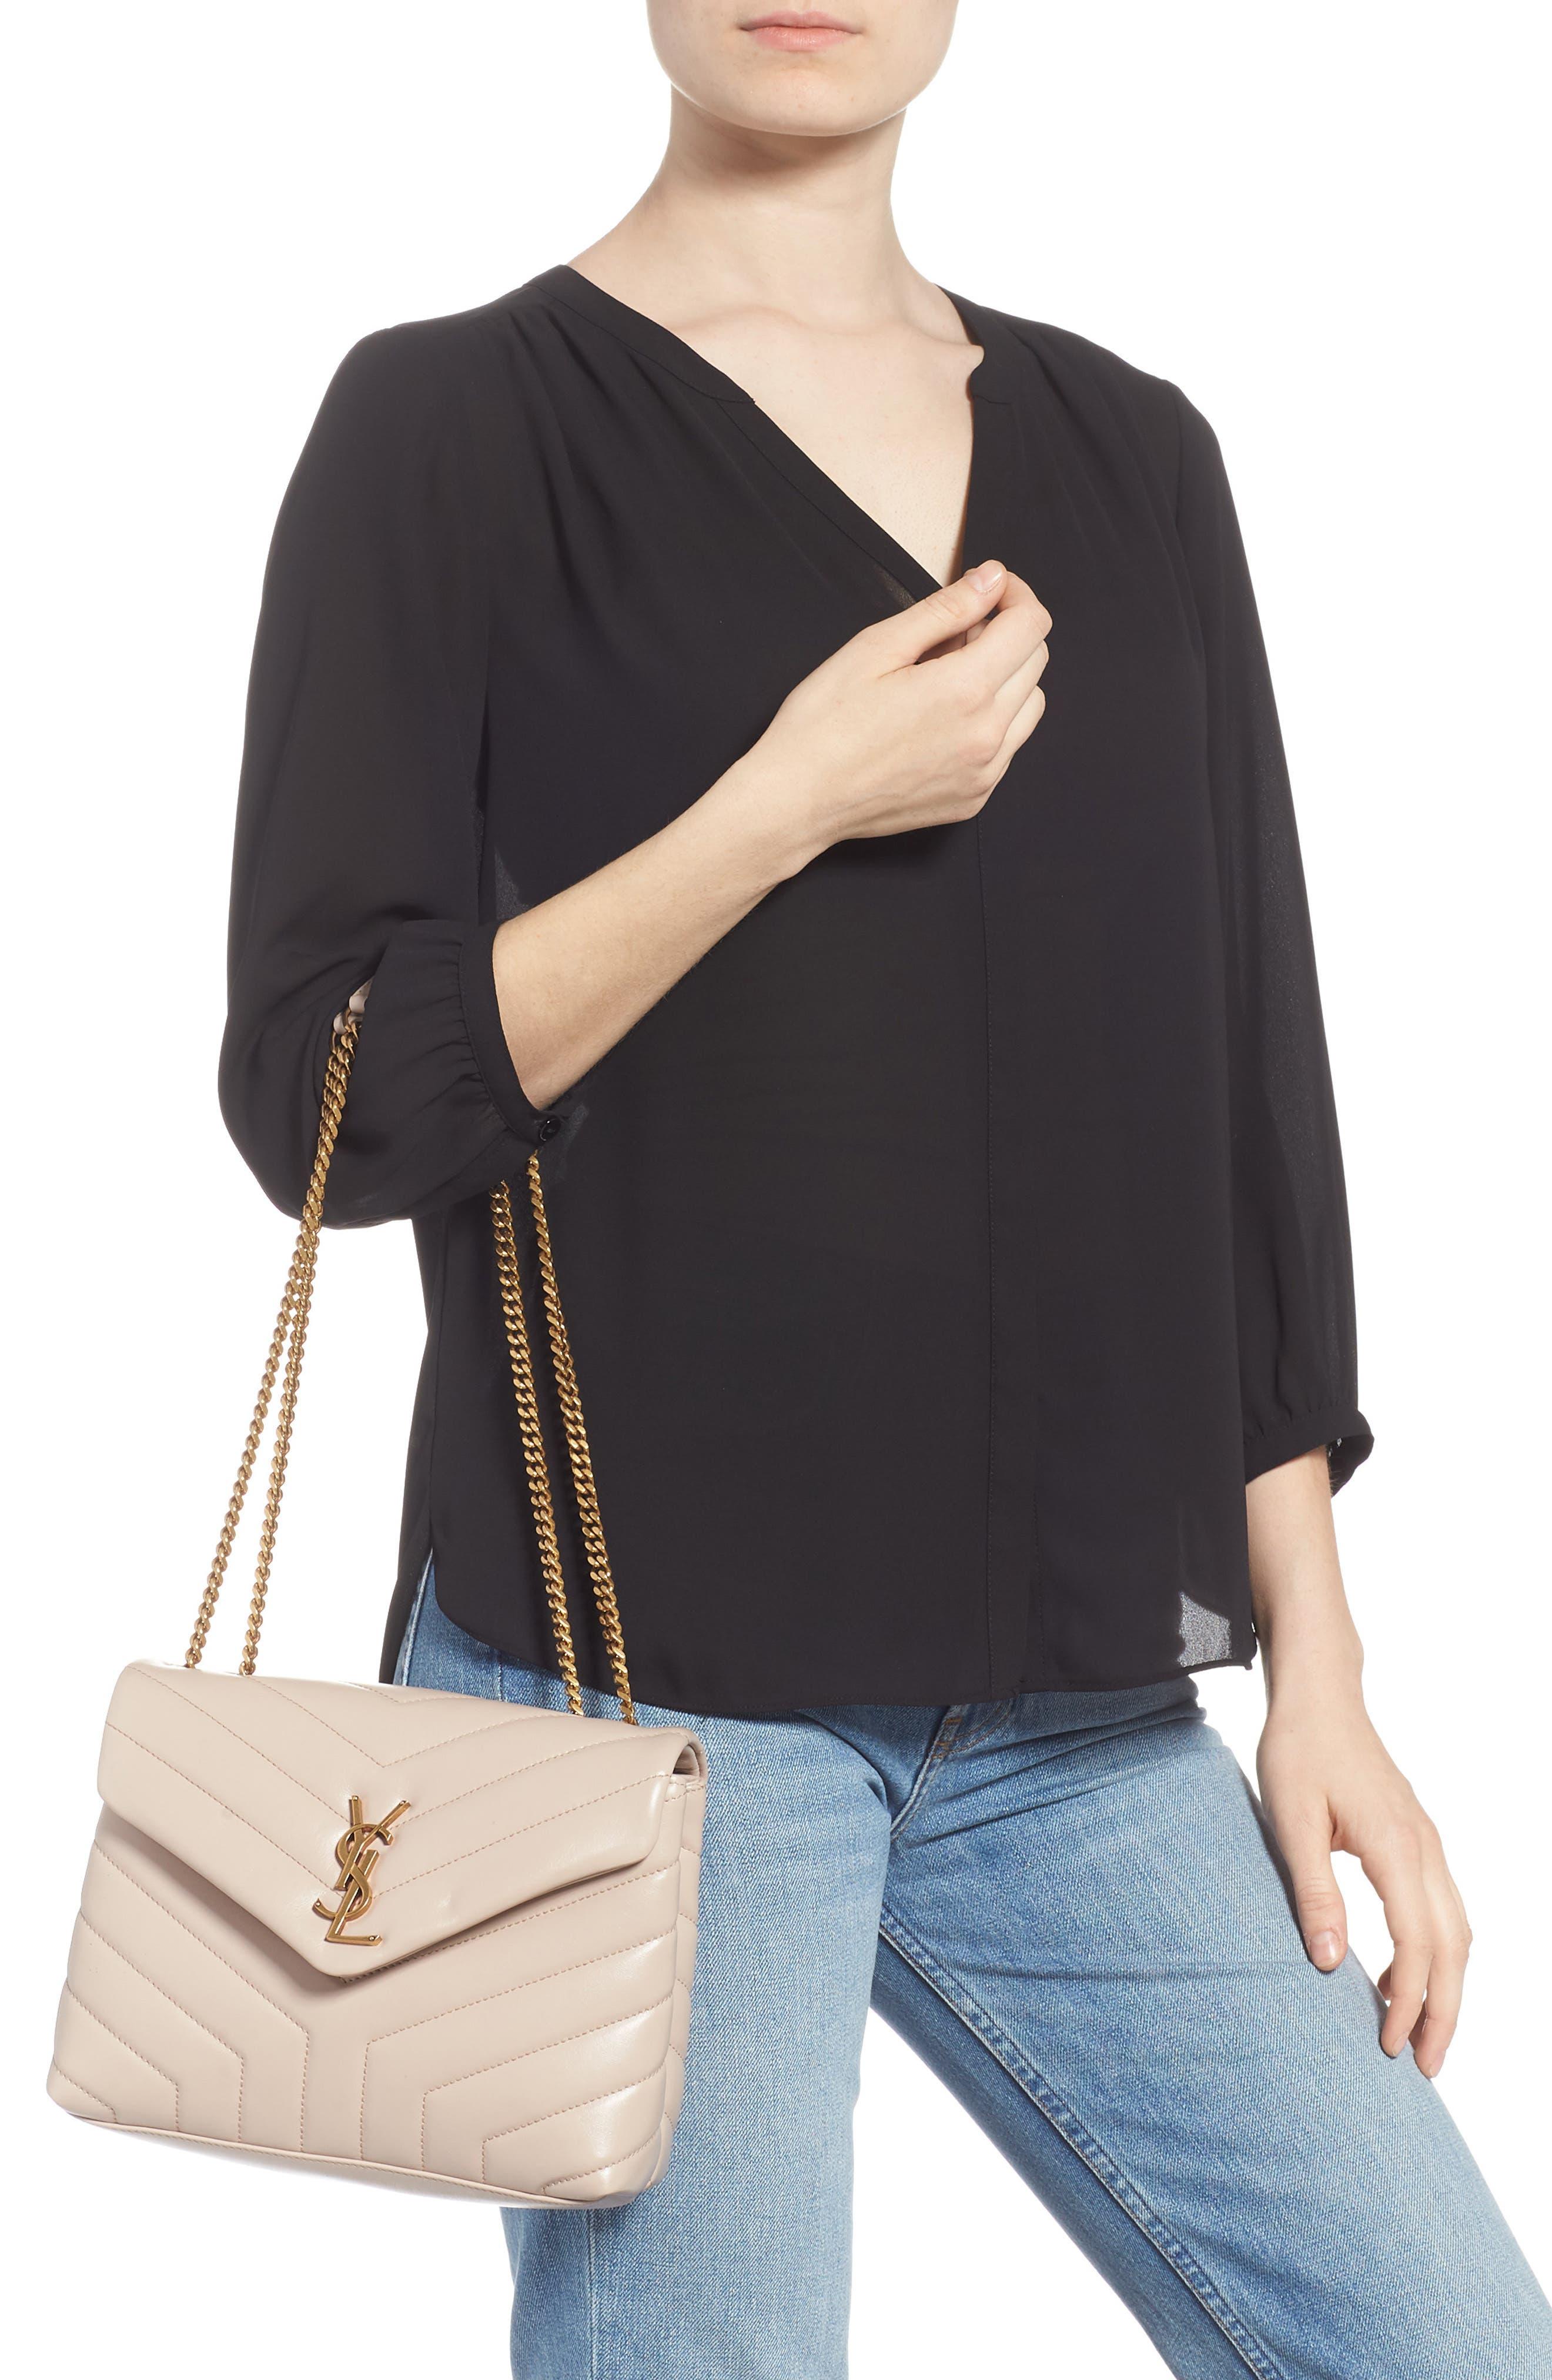 ,                             Small Loulou Leather Shoulder Bag,                             Alternate thumbnail 7, color,                             250